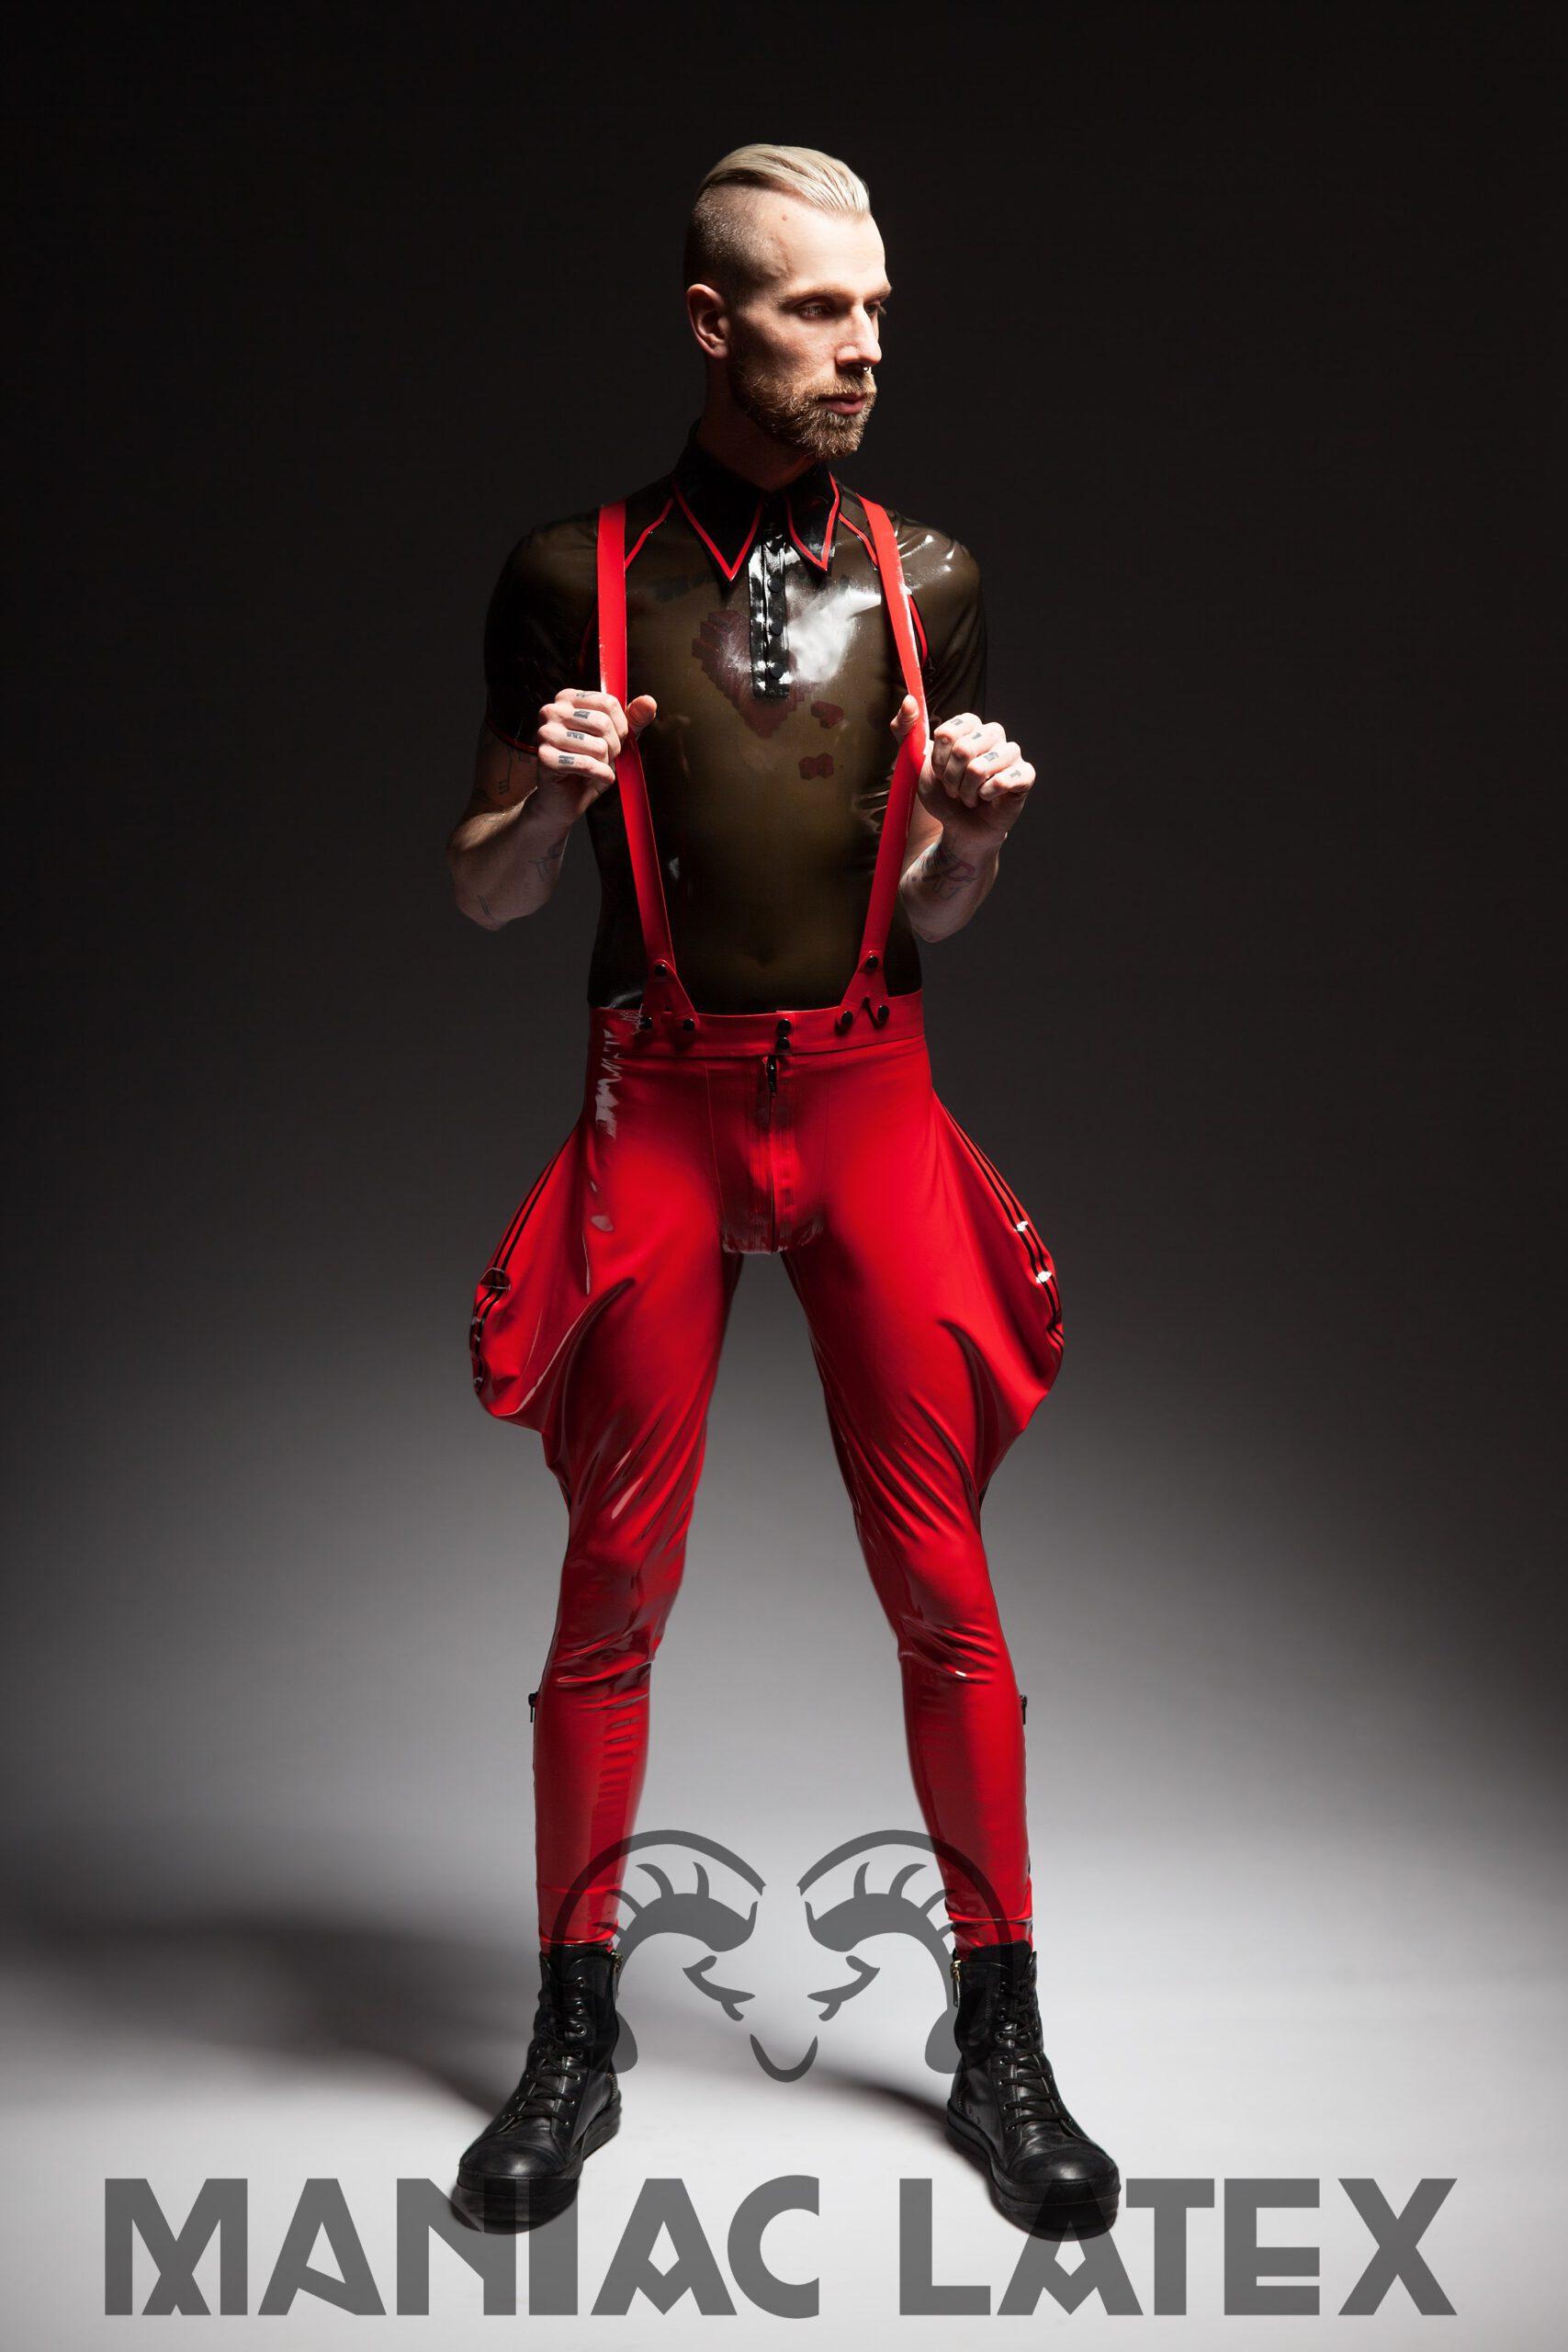 Hardy Polo_Cavalier Pants (1)_The Rising_Maniac Latex